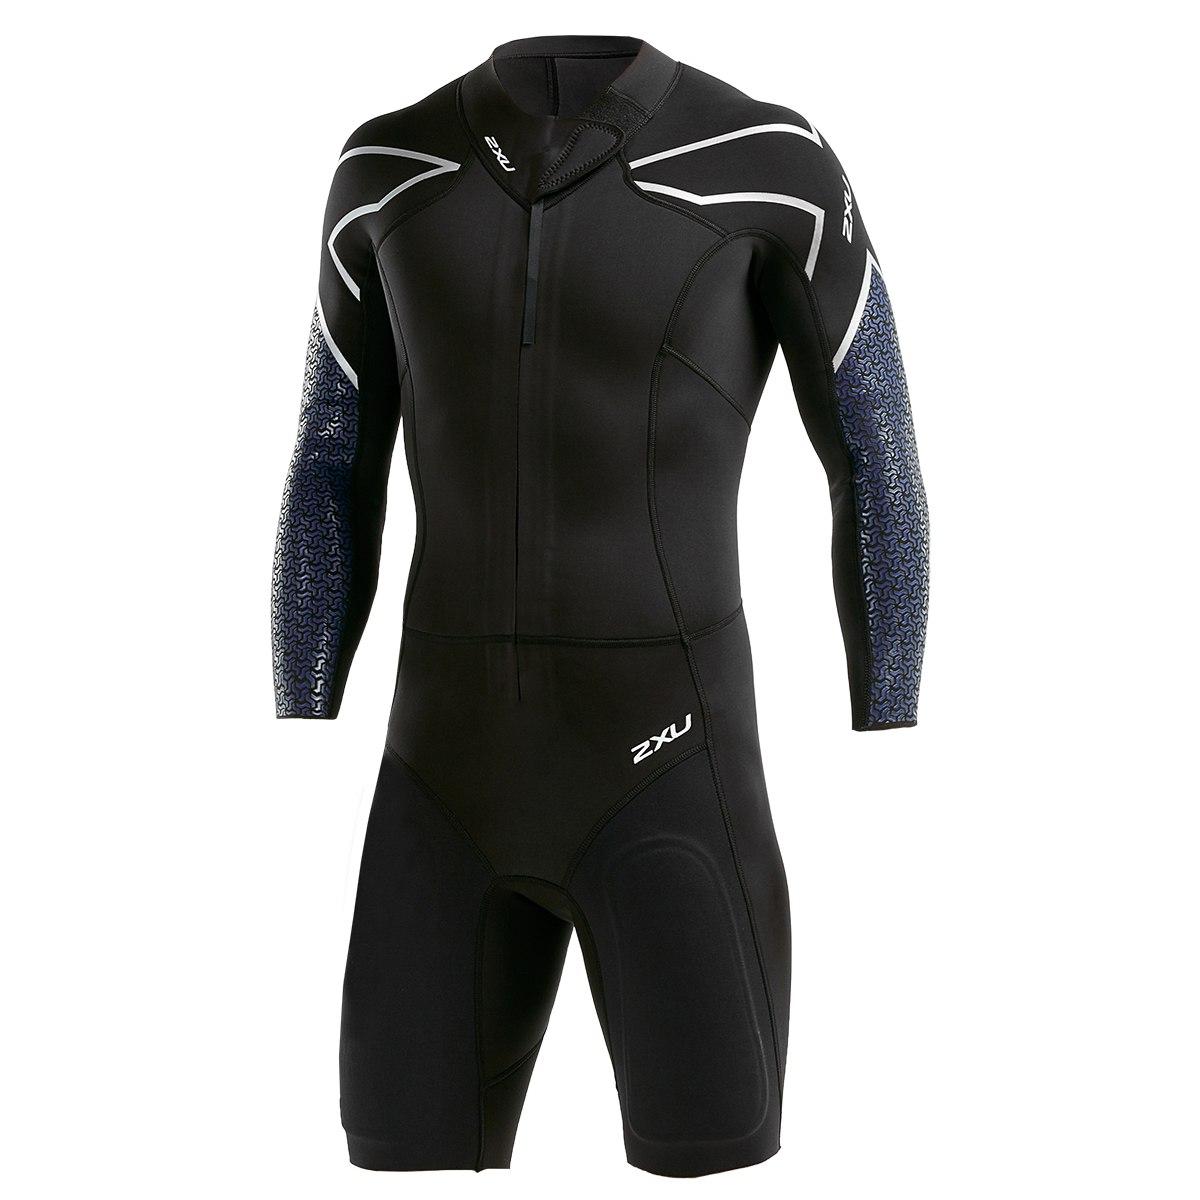 2XU SR:1 Swimrun SR1 Wetsuit - black/blue surf print